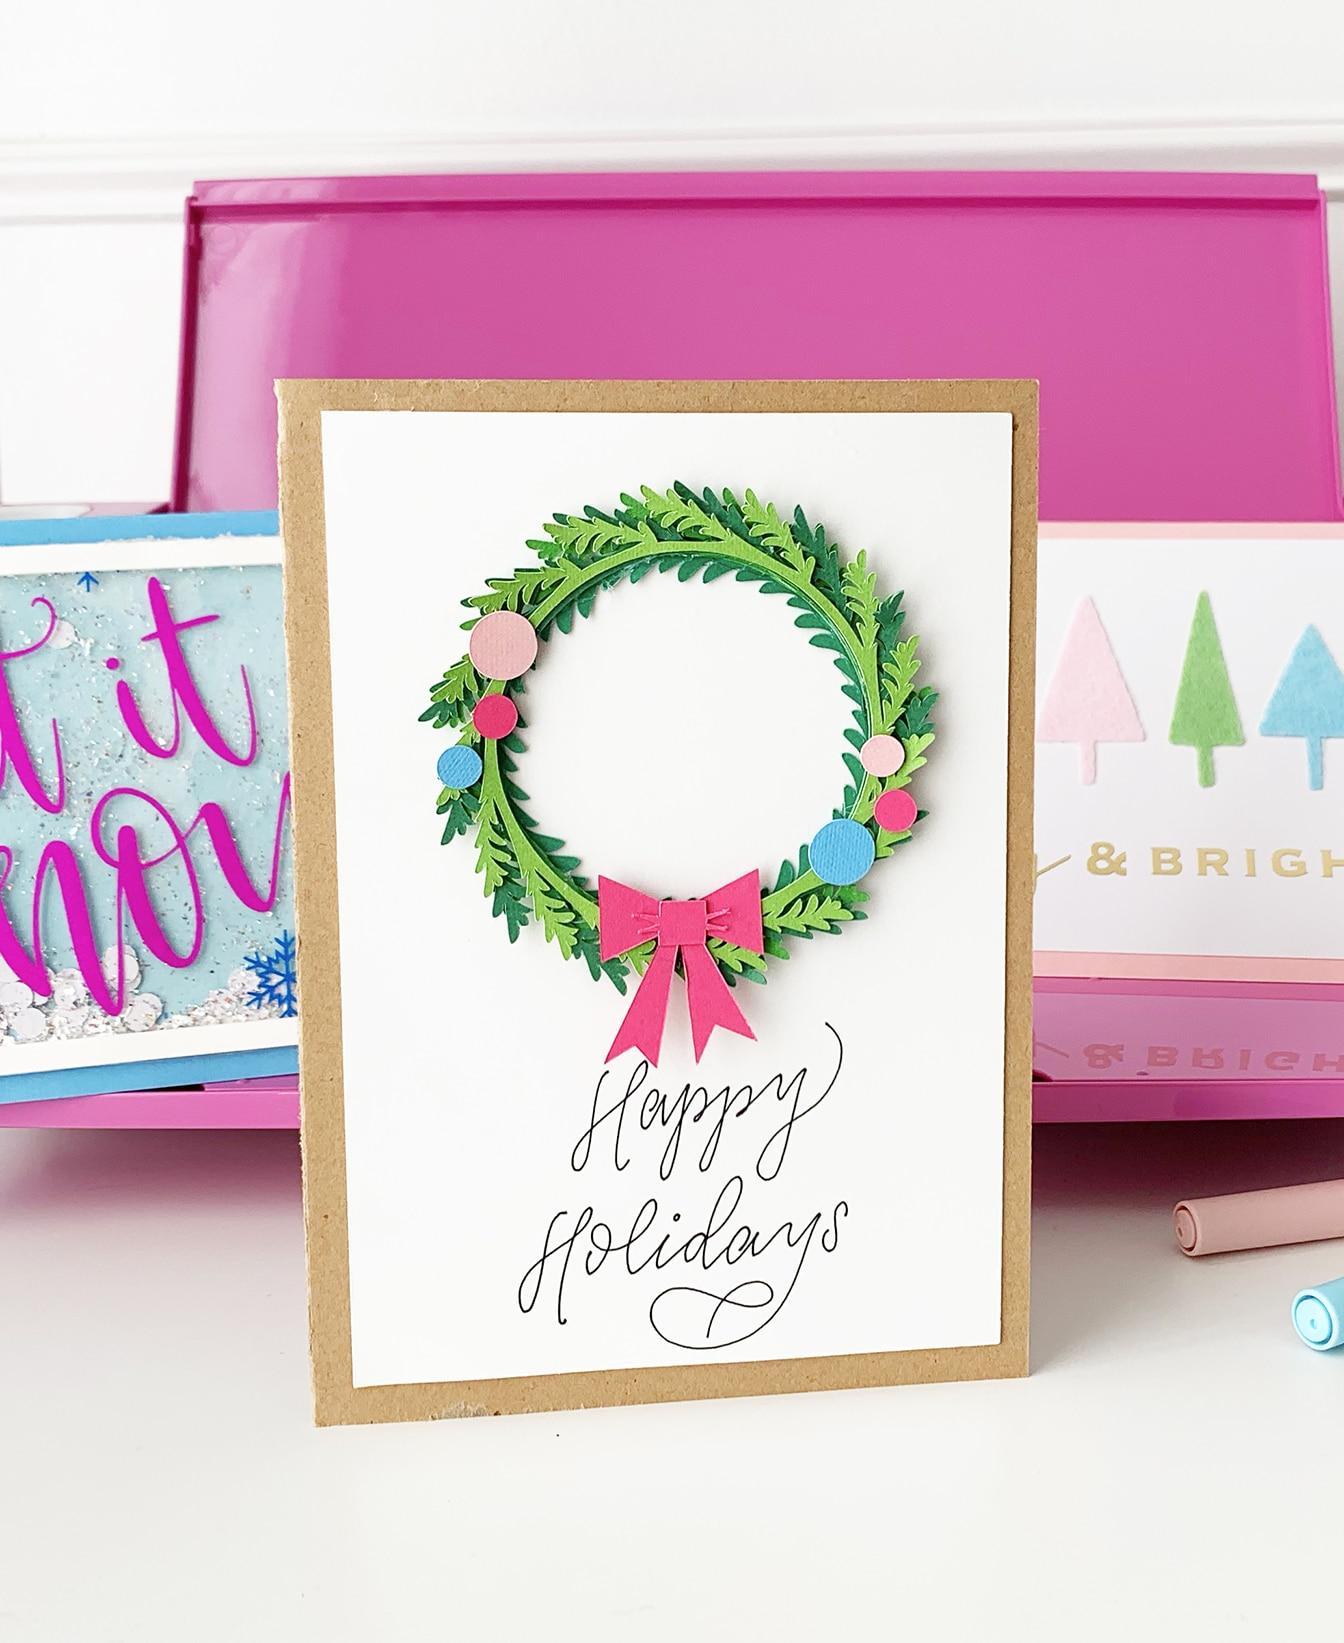 DIY Christmas Cards - Cricut Explore Air 2 Projects ...